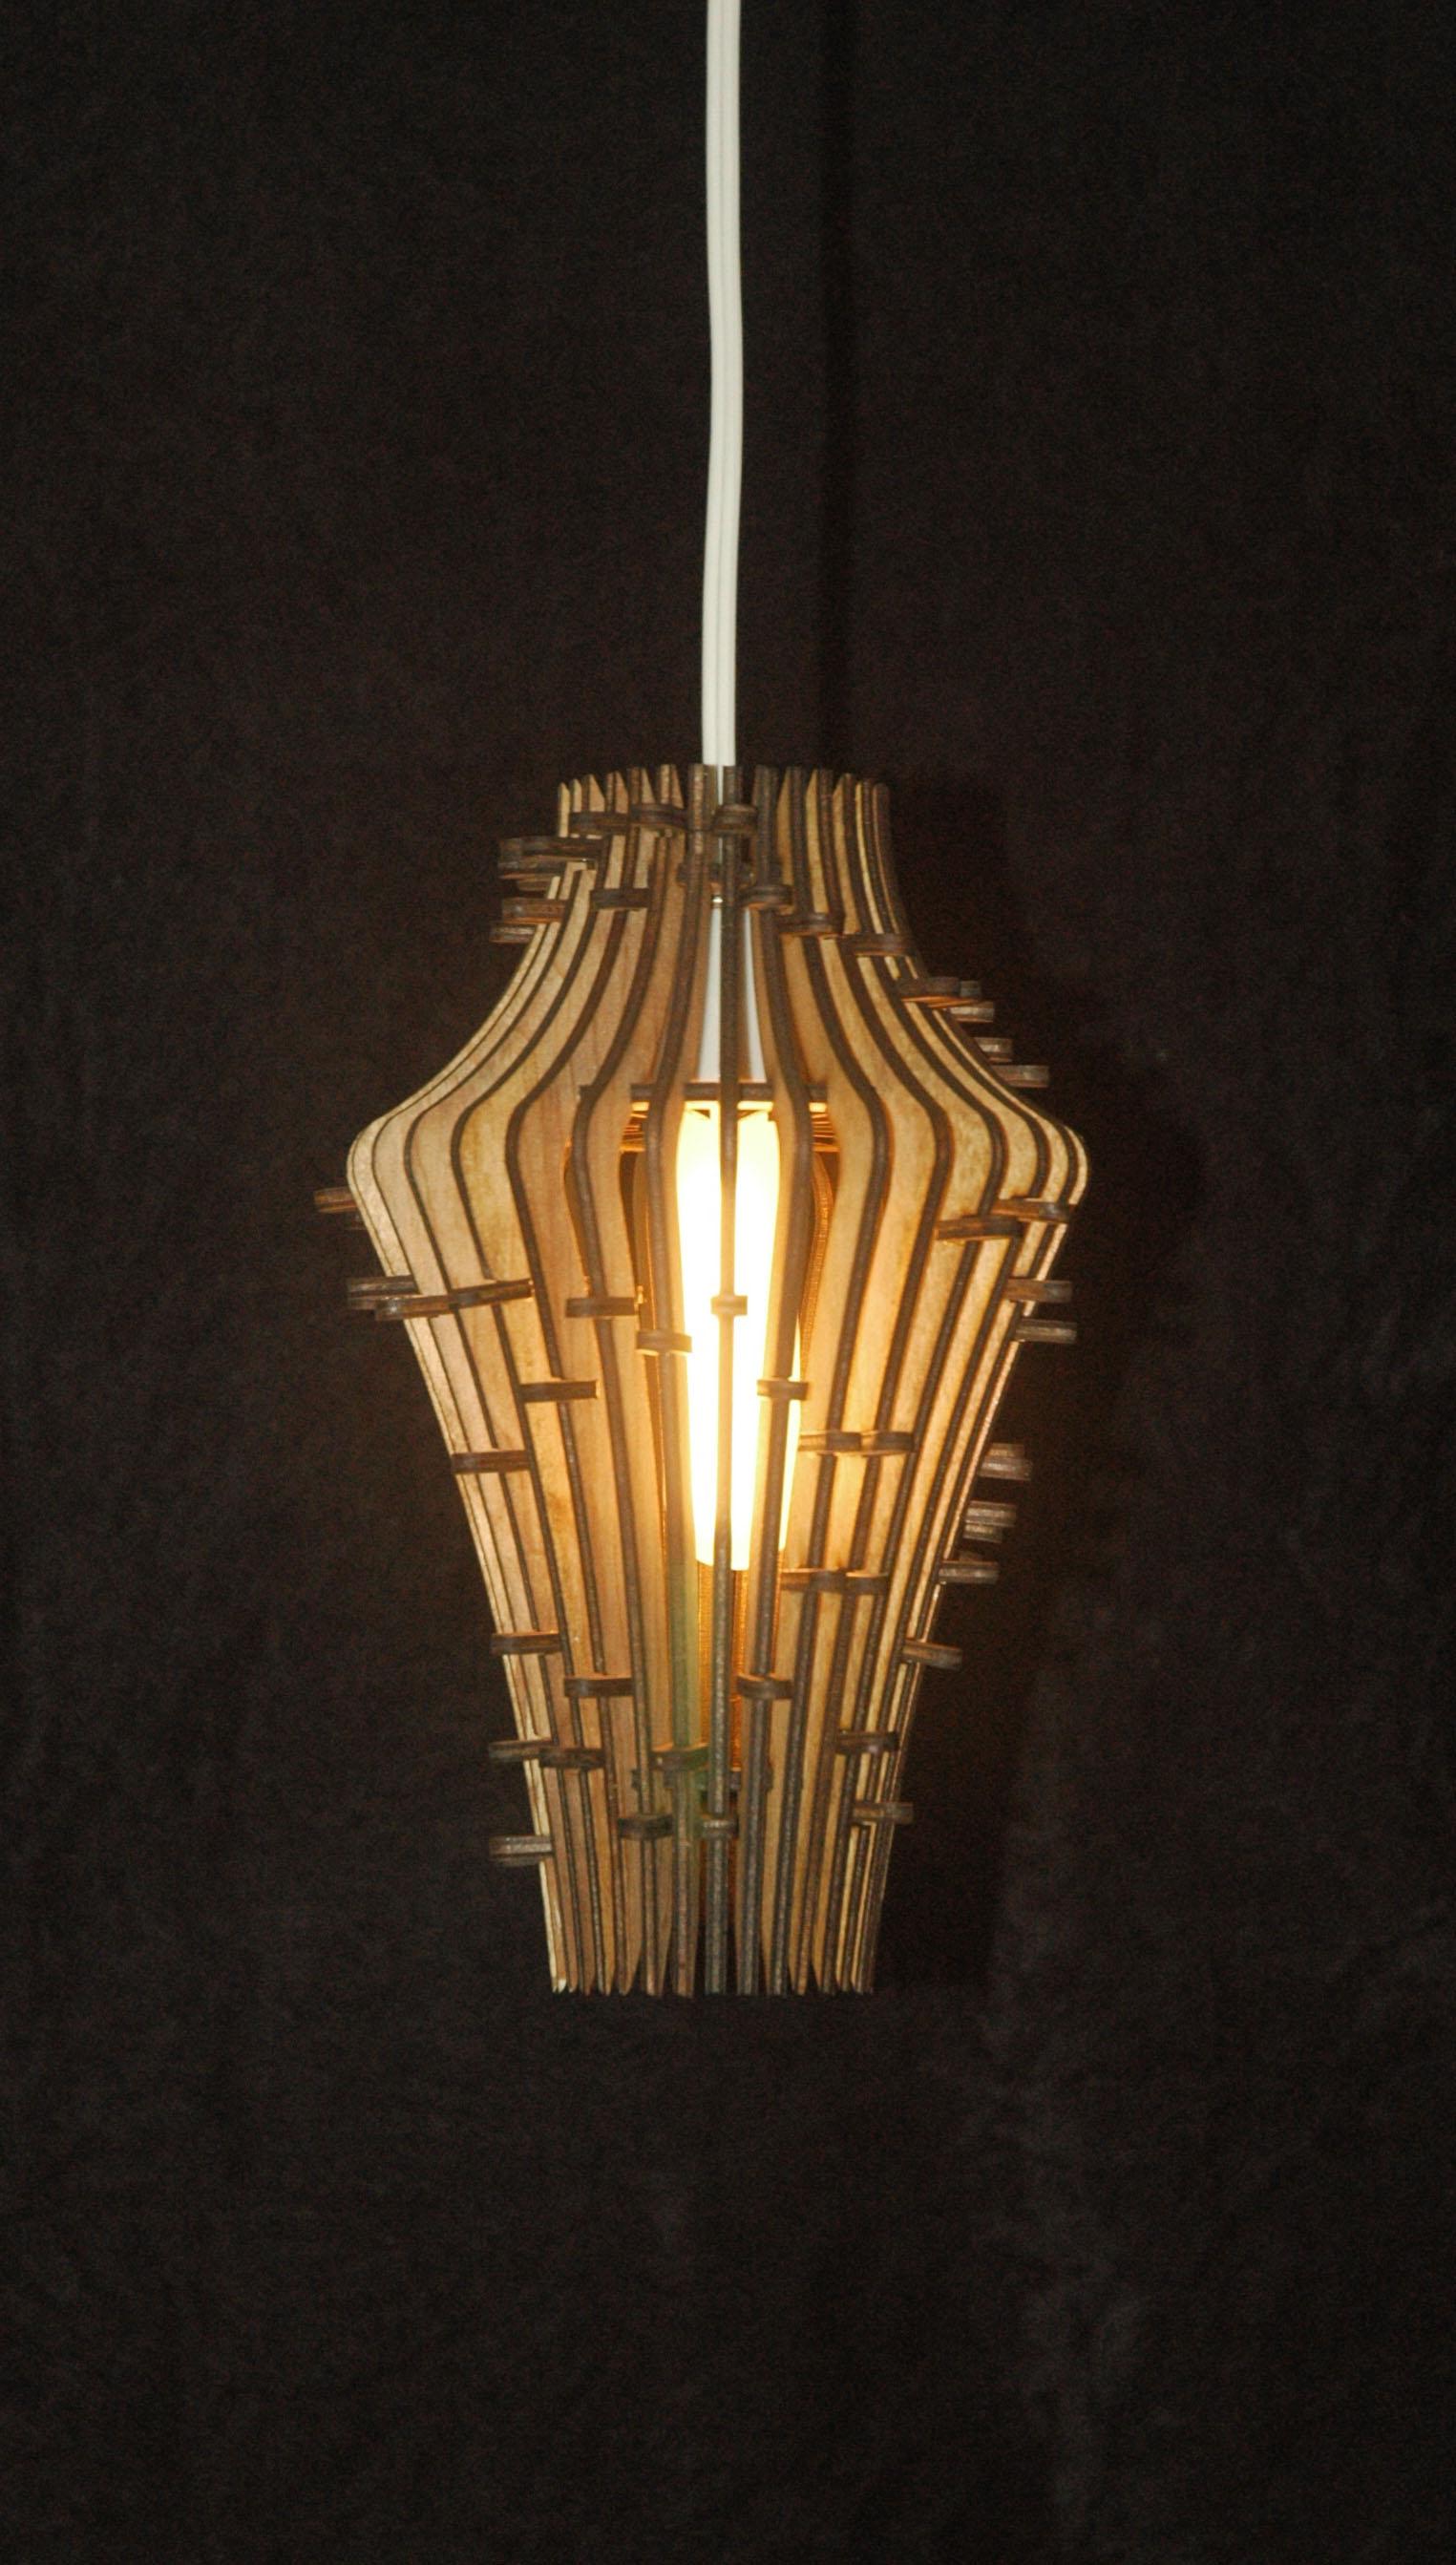 JTR Lamp 3